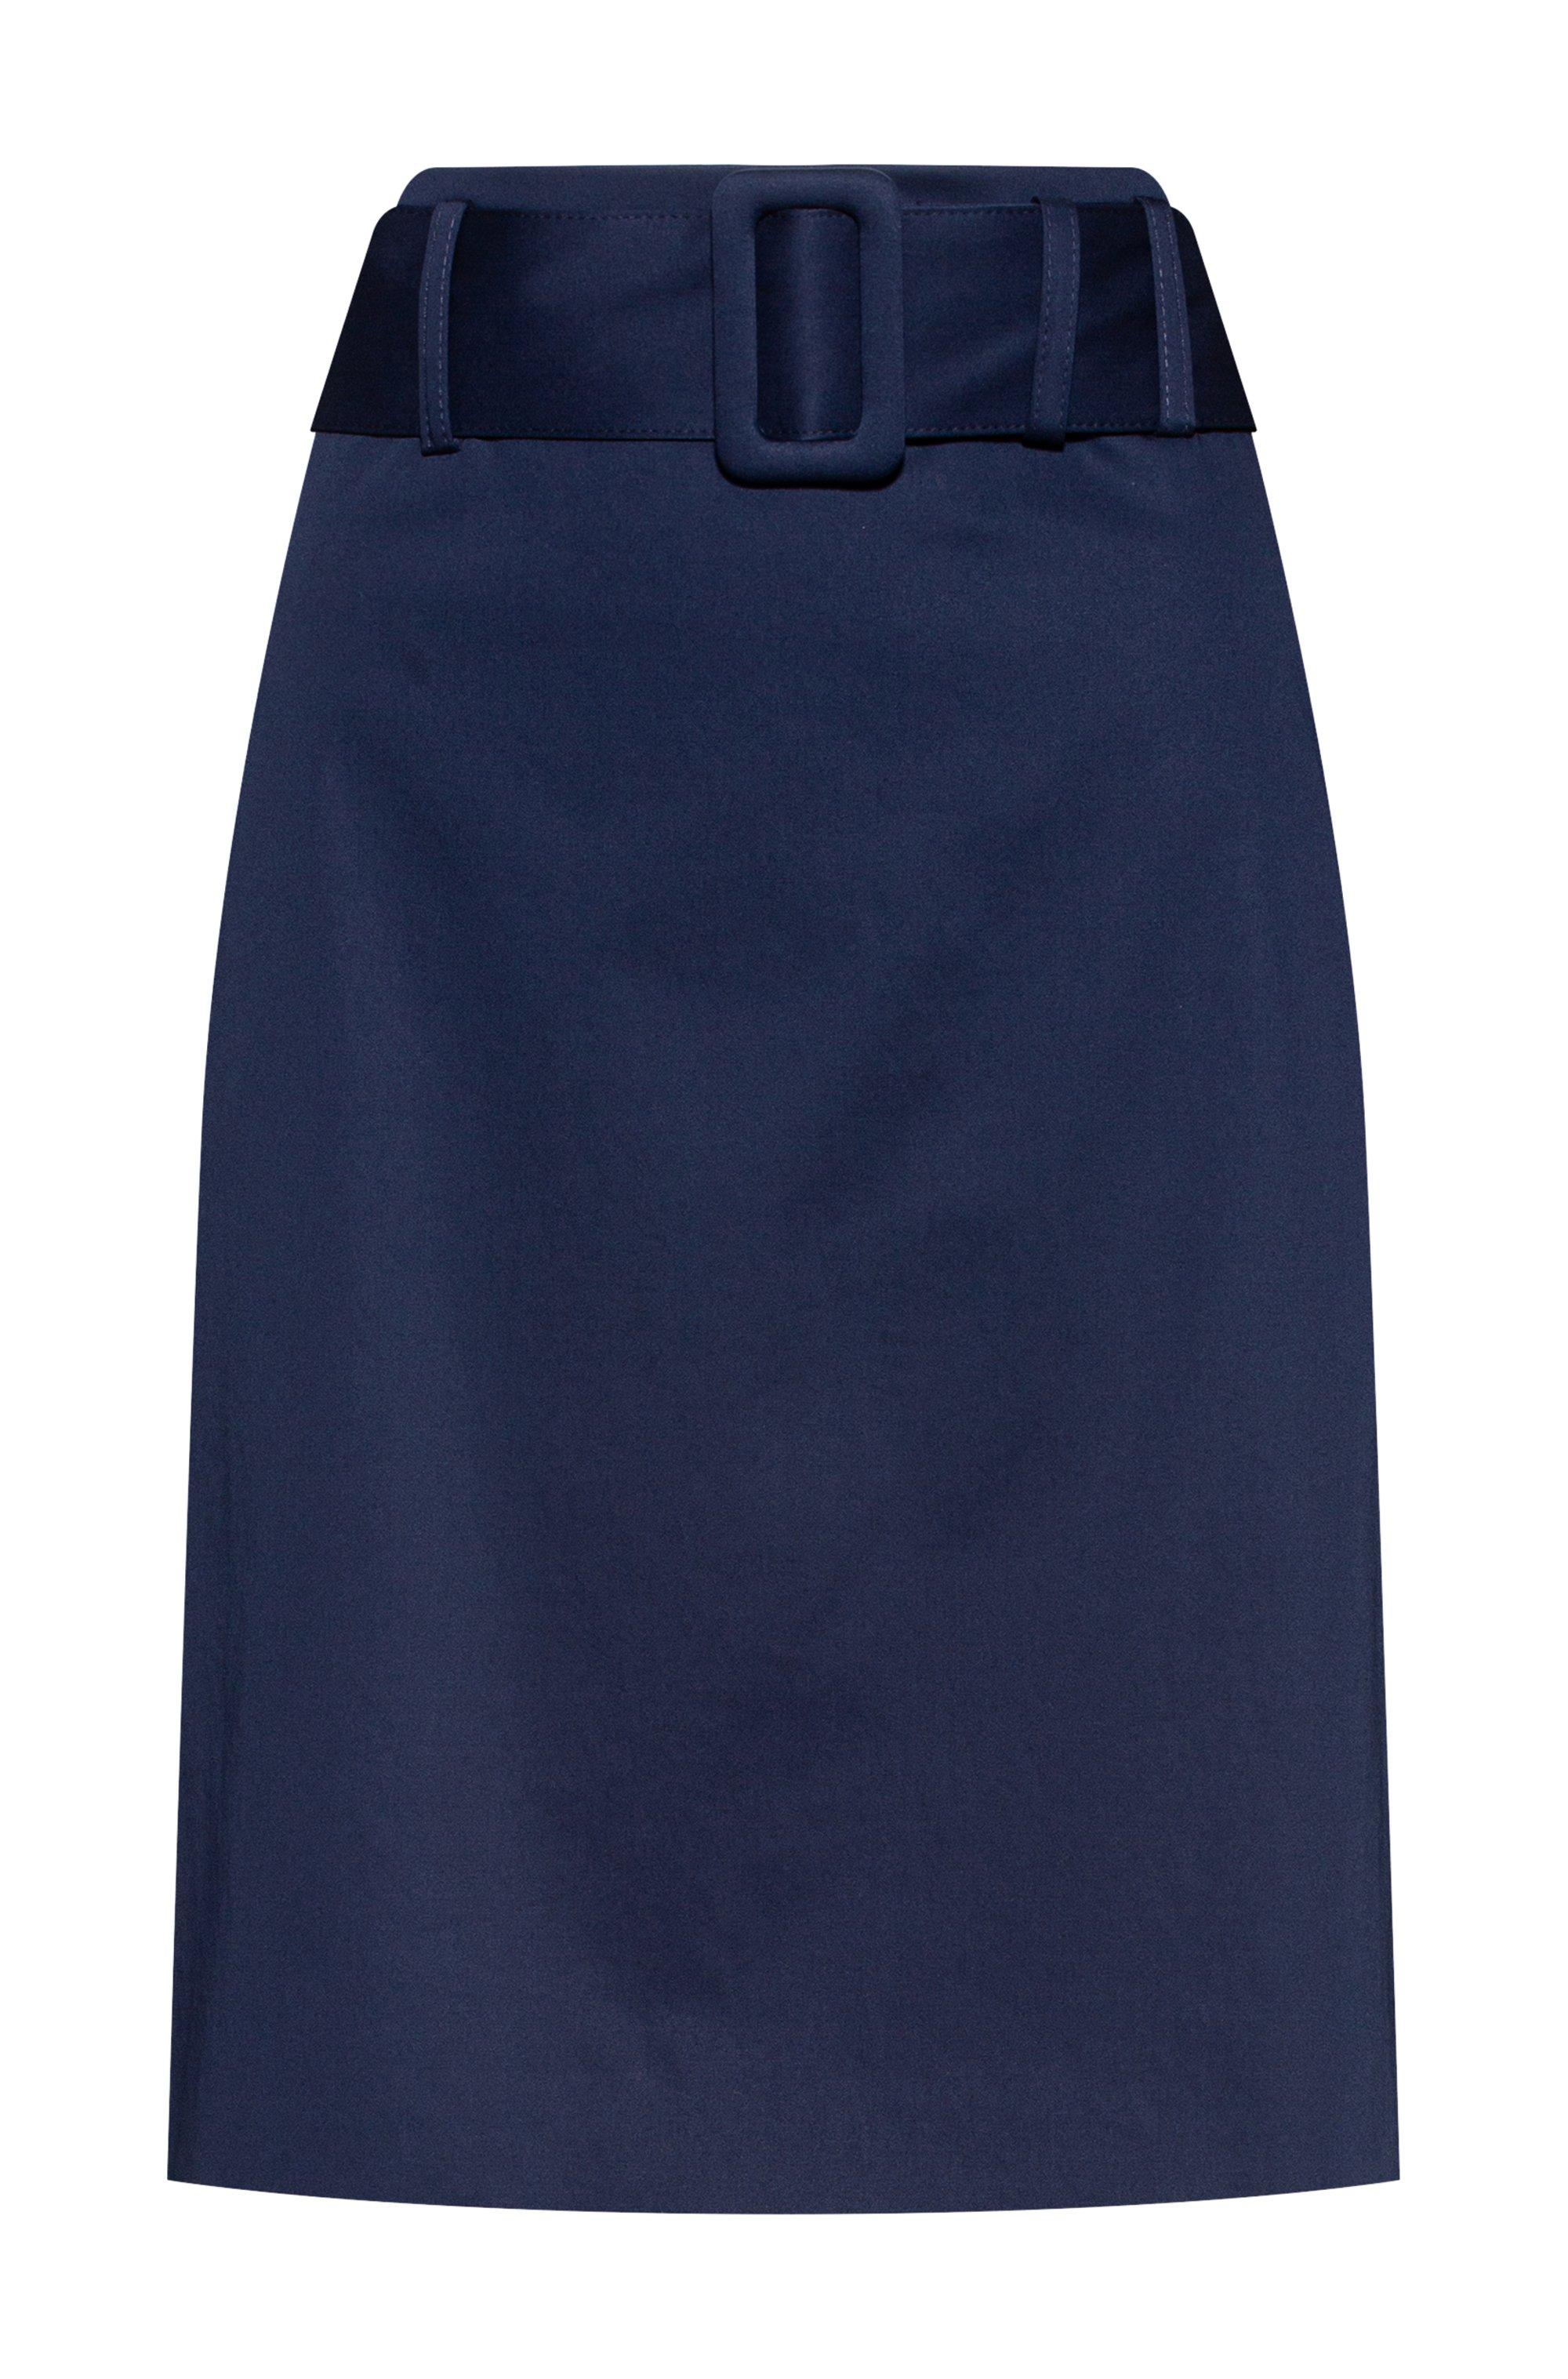 Pencil skirt in stretch cotton with belted waist, Dark Blue